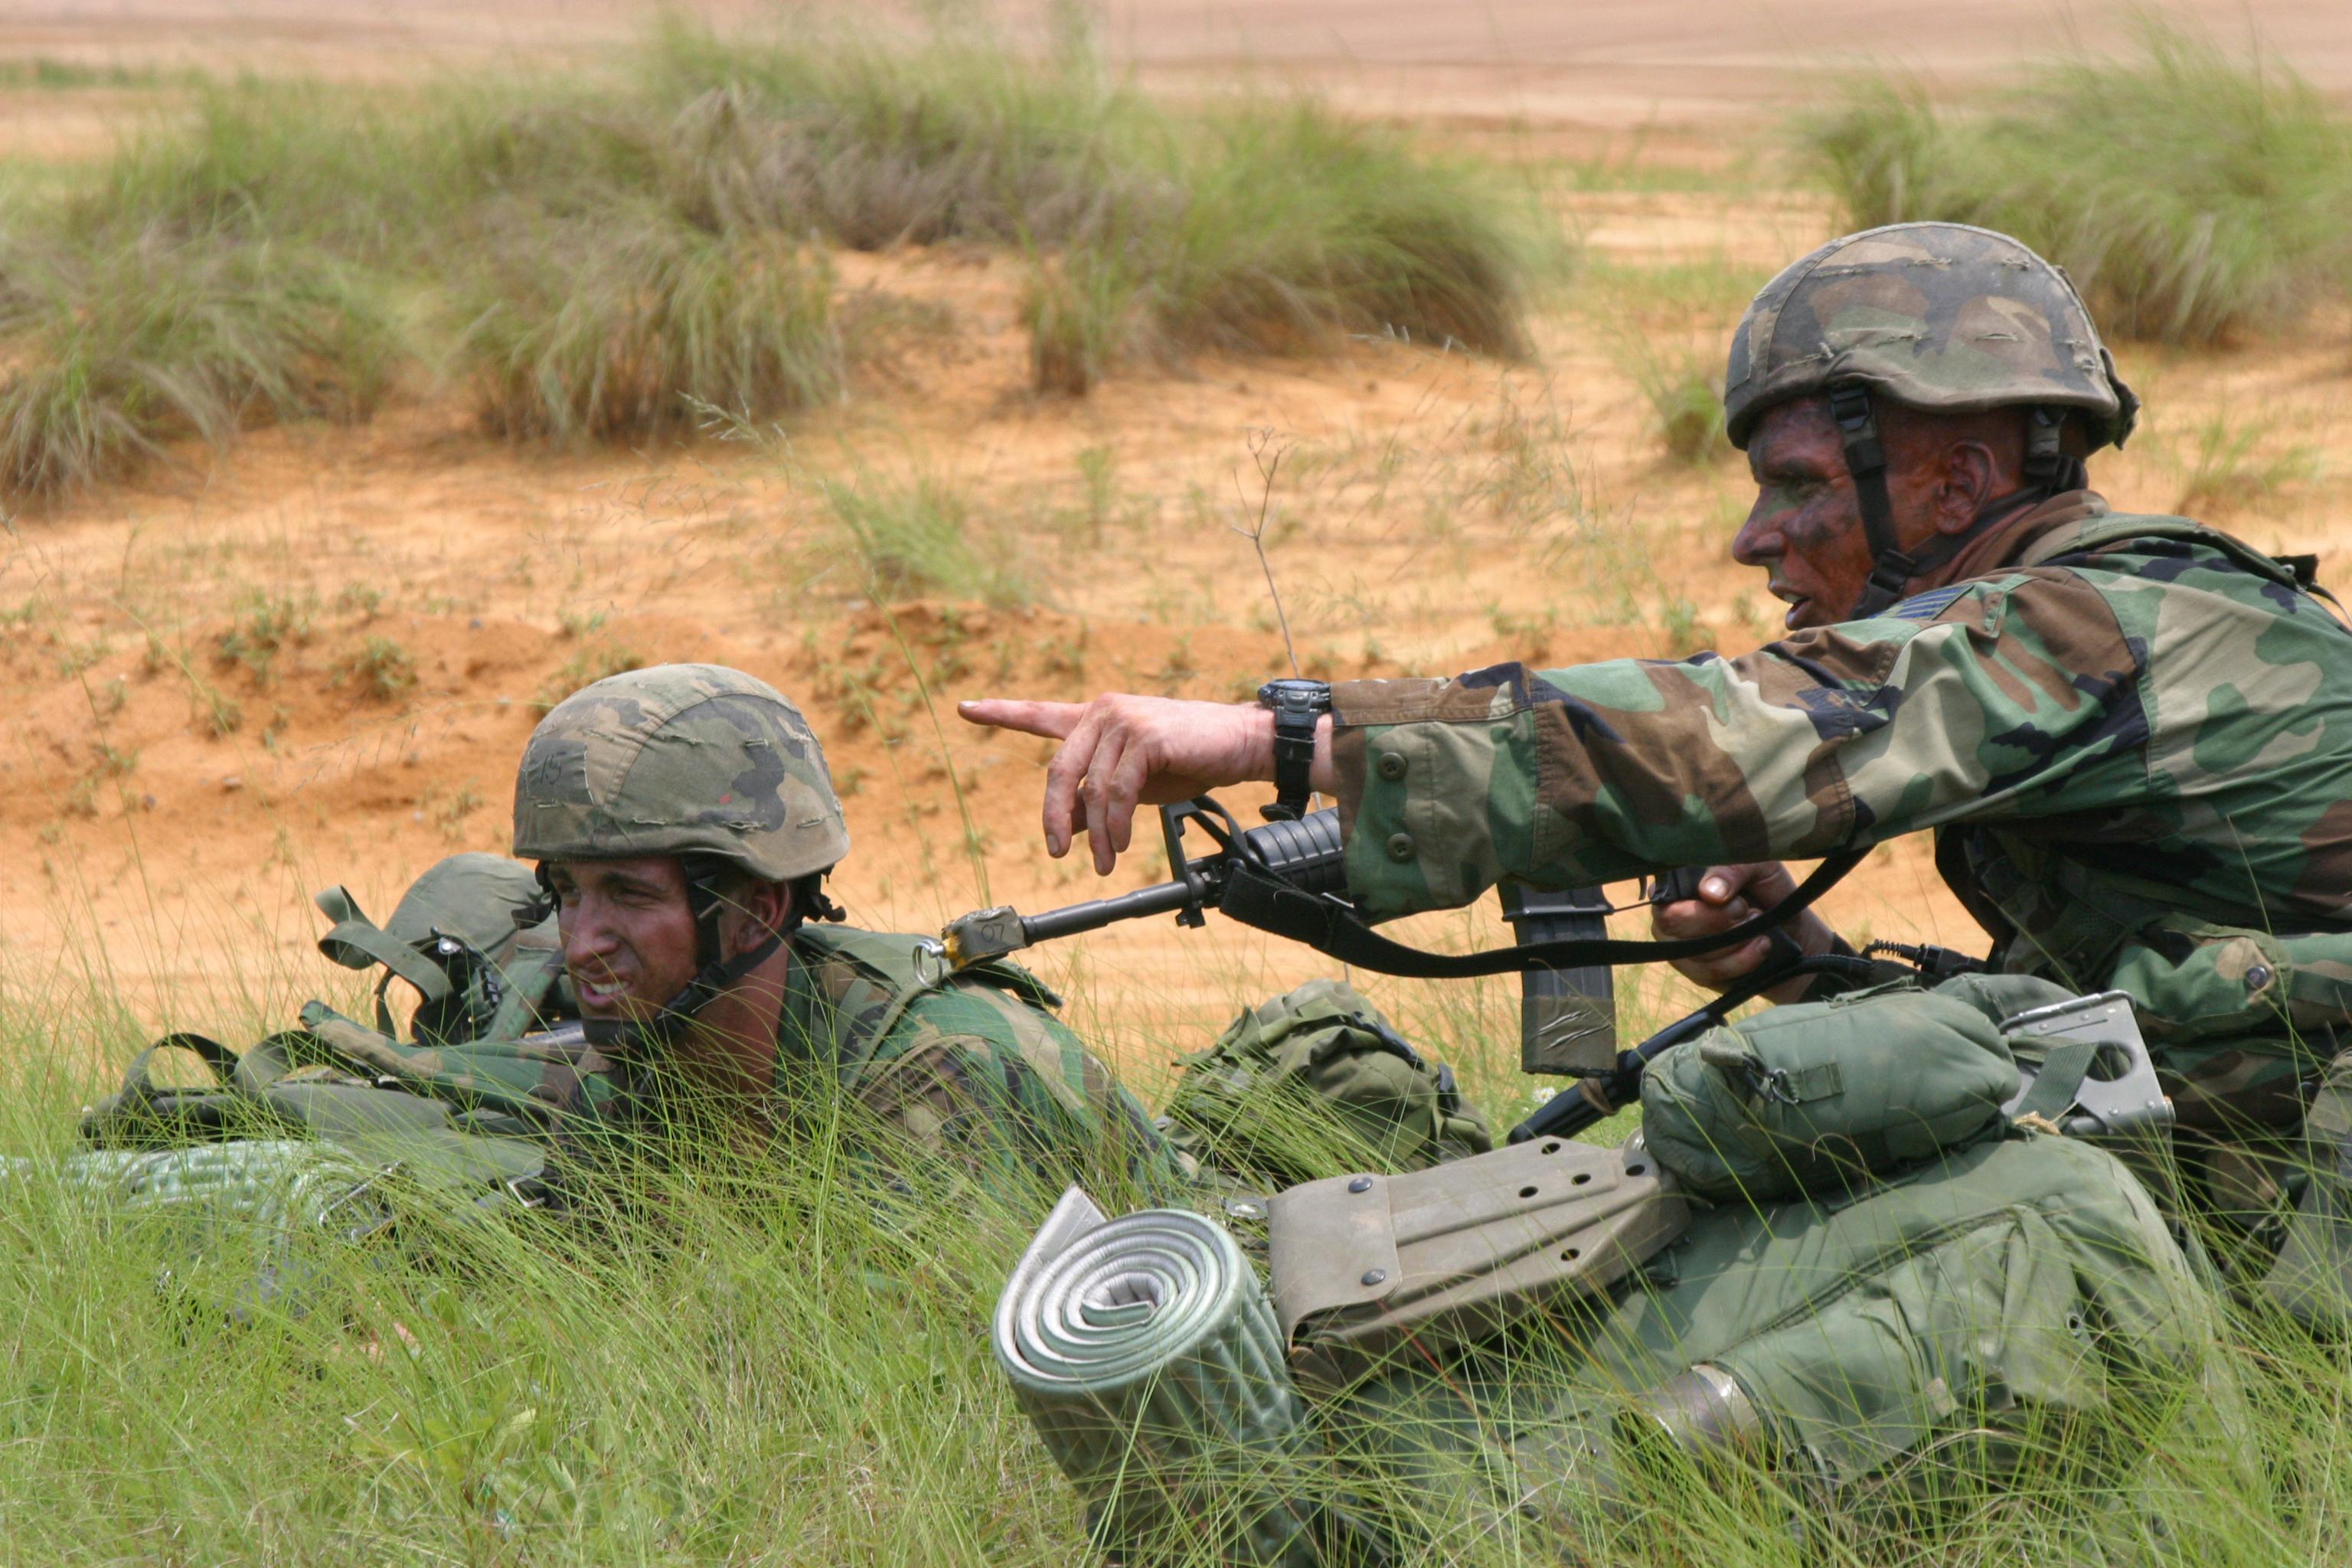 86121c06ed66 Airmen train to wear scarlet beret > U.S. Air Force > Display